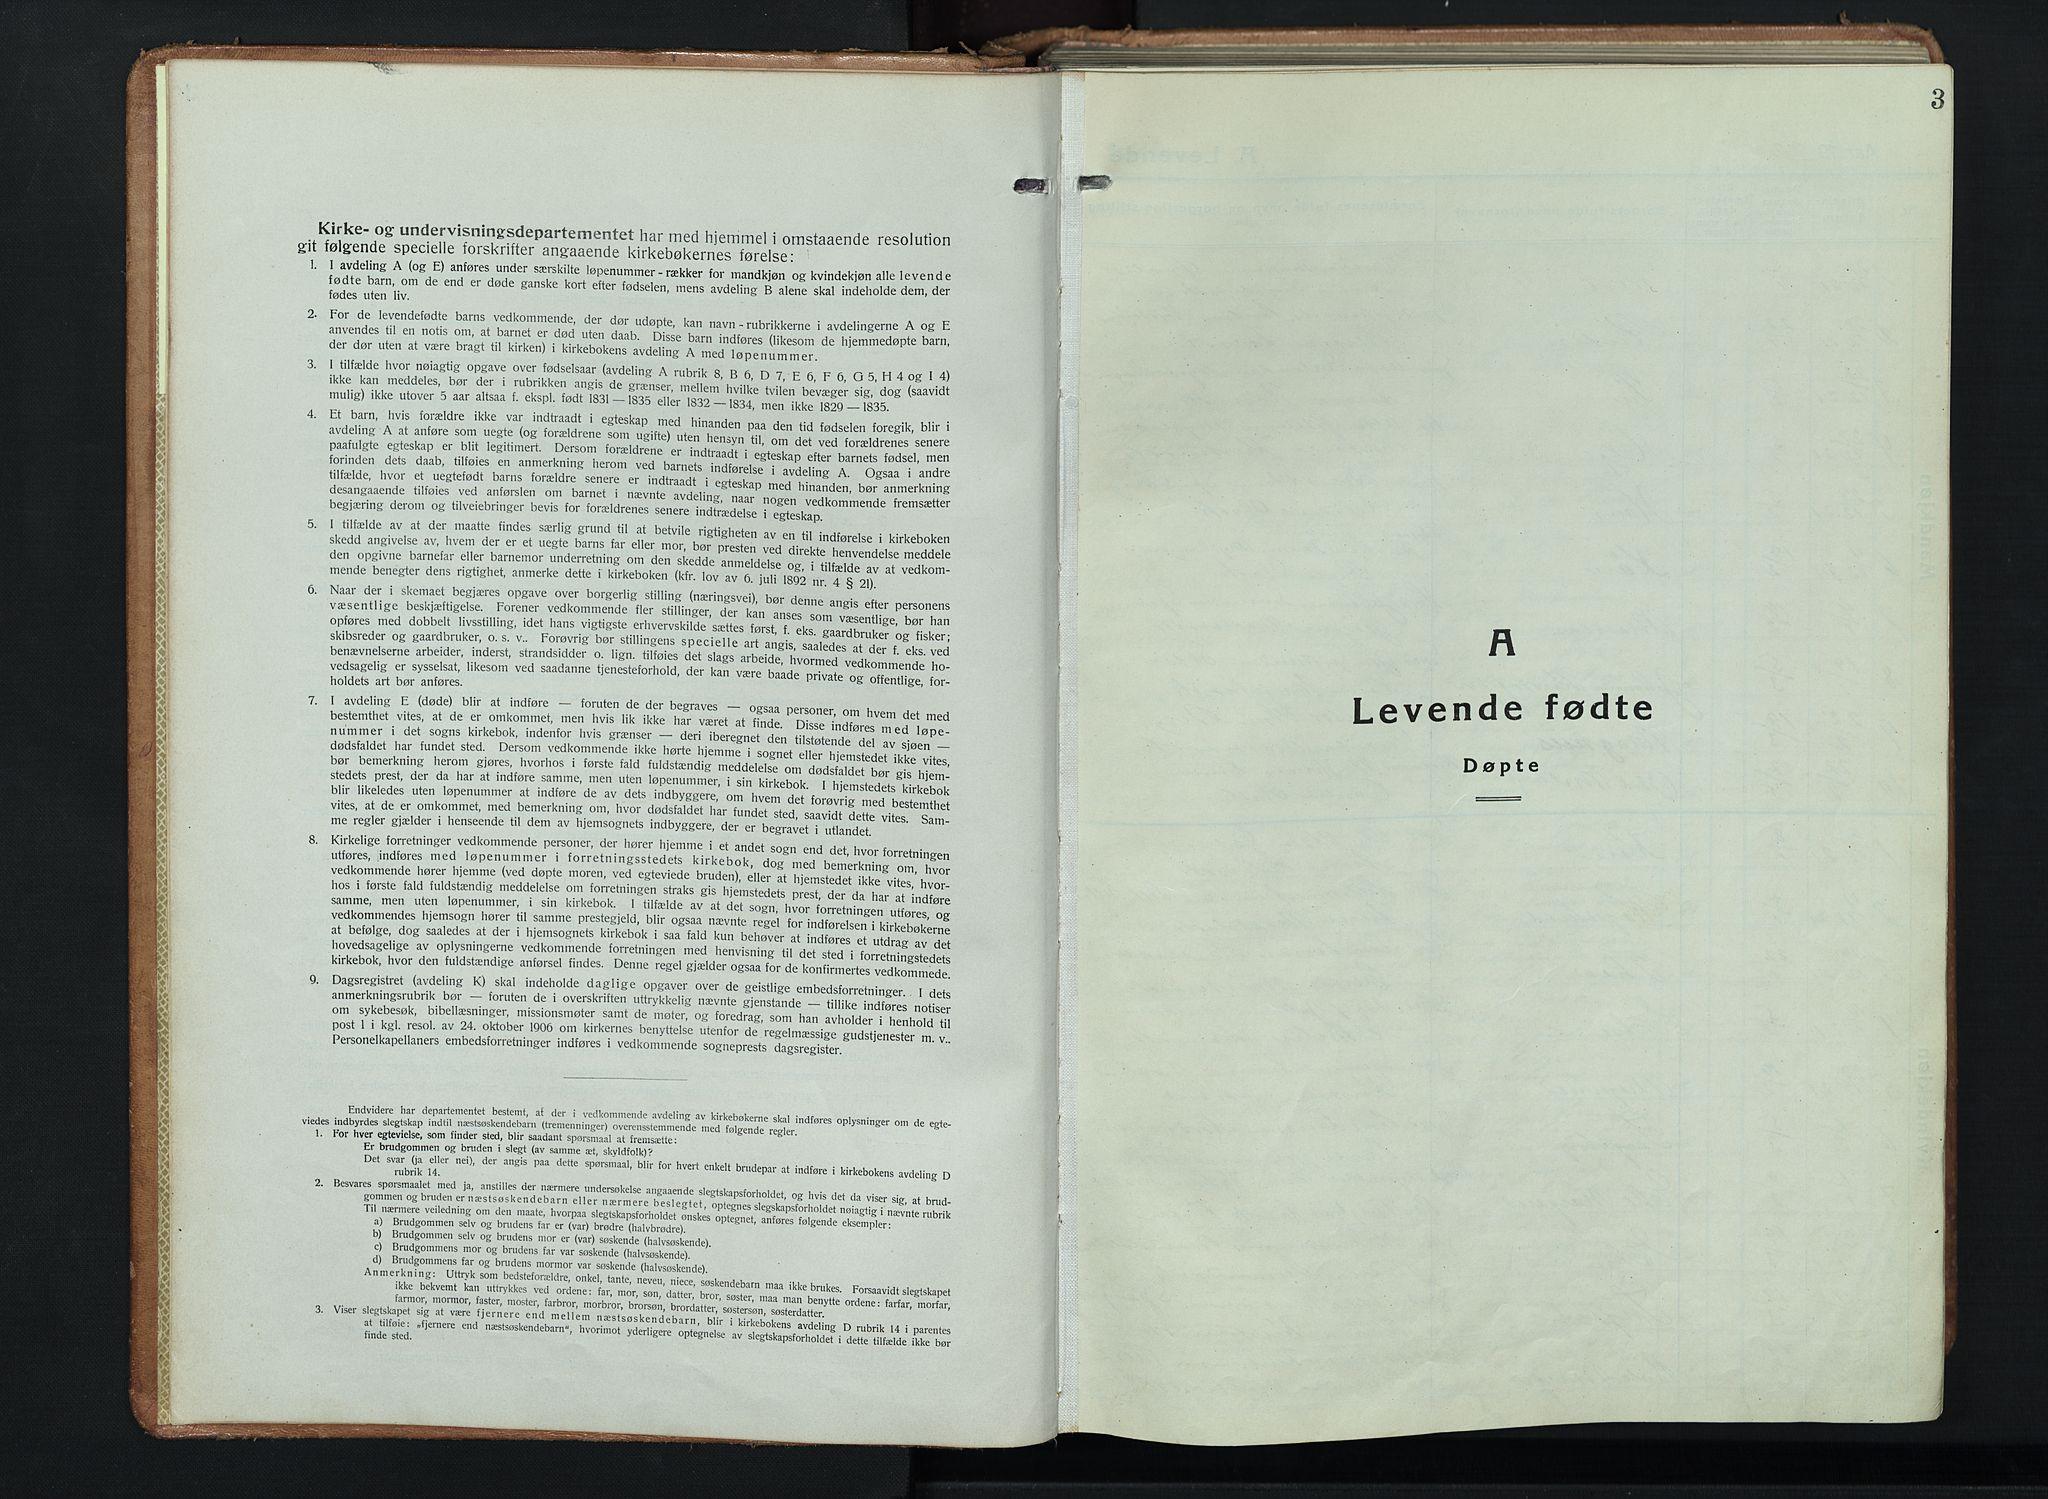 SAH, Ringebu prestekontor, Klokkerbok nr. 11, 1921-1943, s. 3